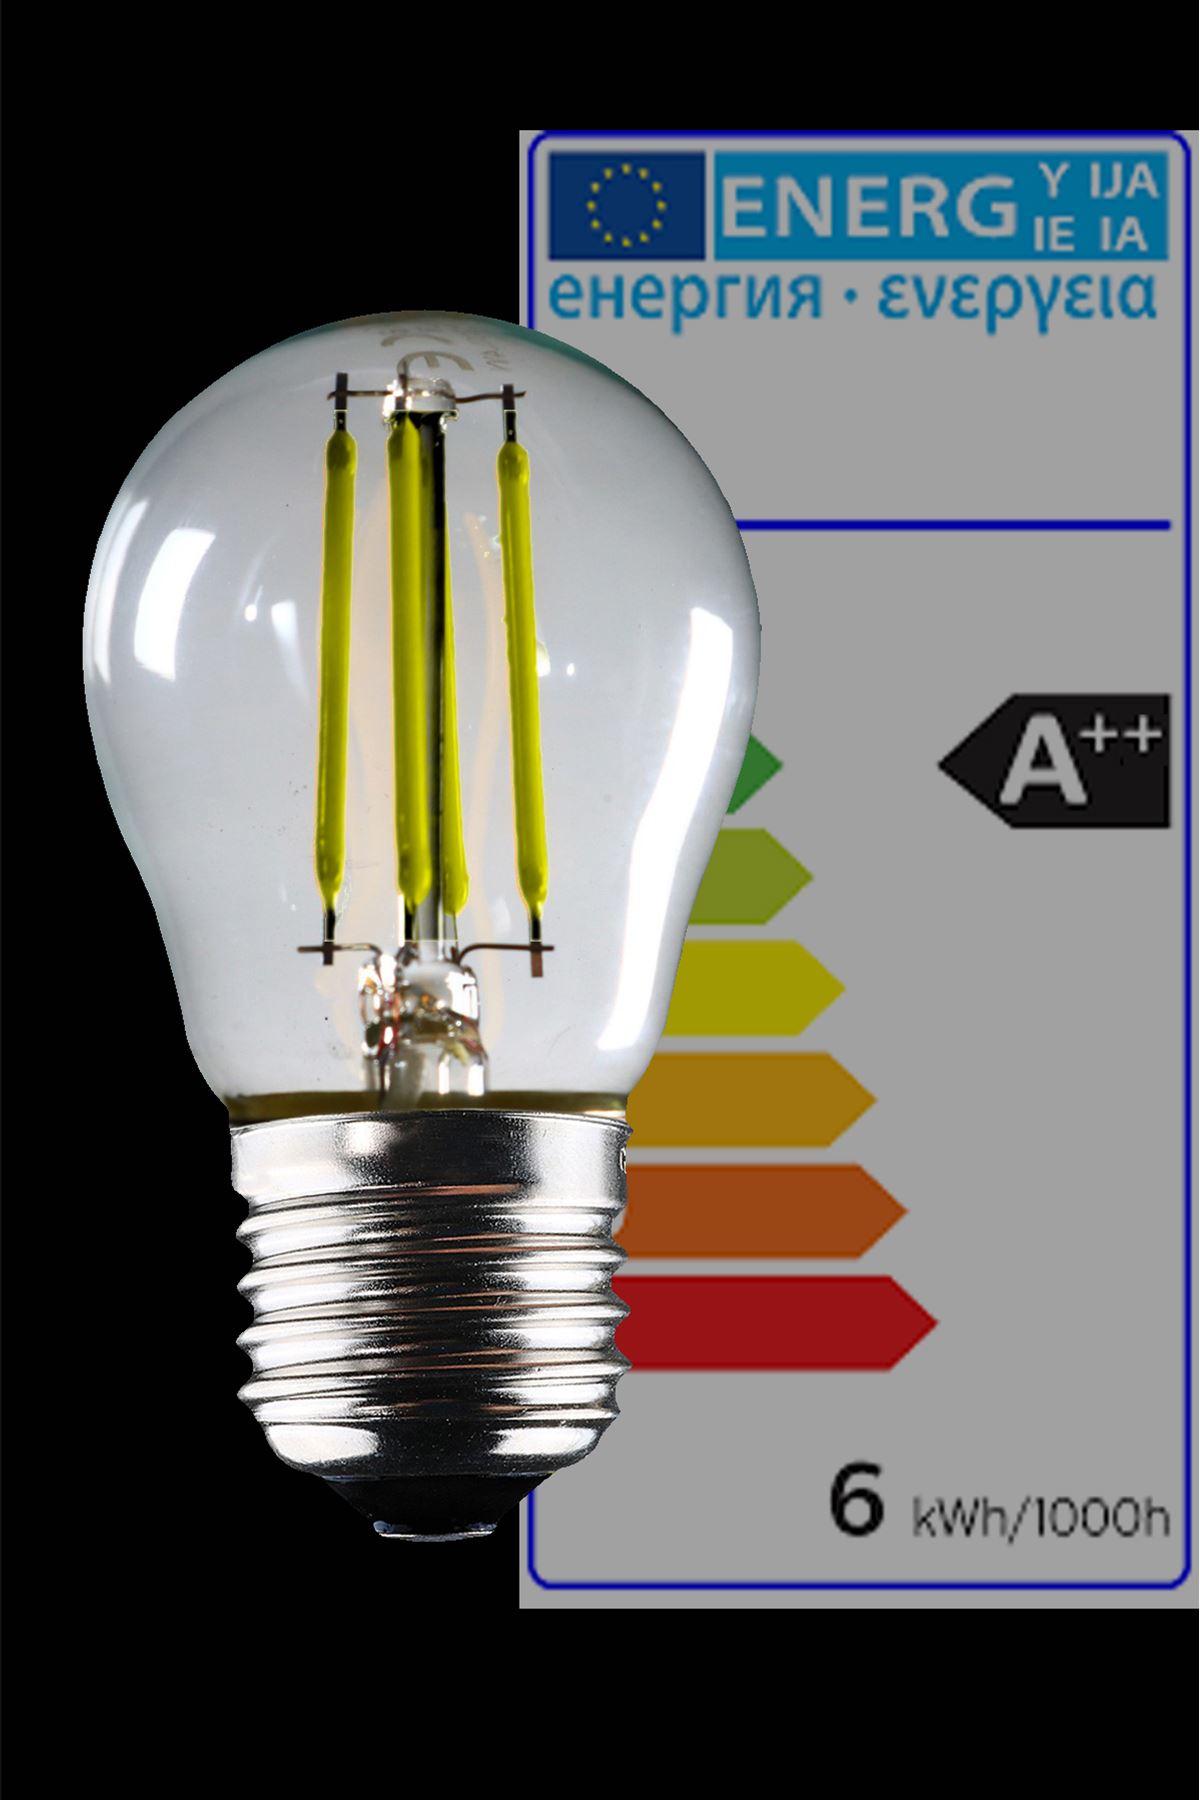 Luzarana  E27 G45  6 Watt Beyaz Işık Standart Tip Filament Edison Tip Rustik LED Top Ampül (Heka)